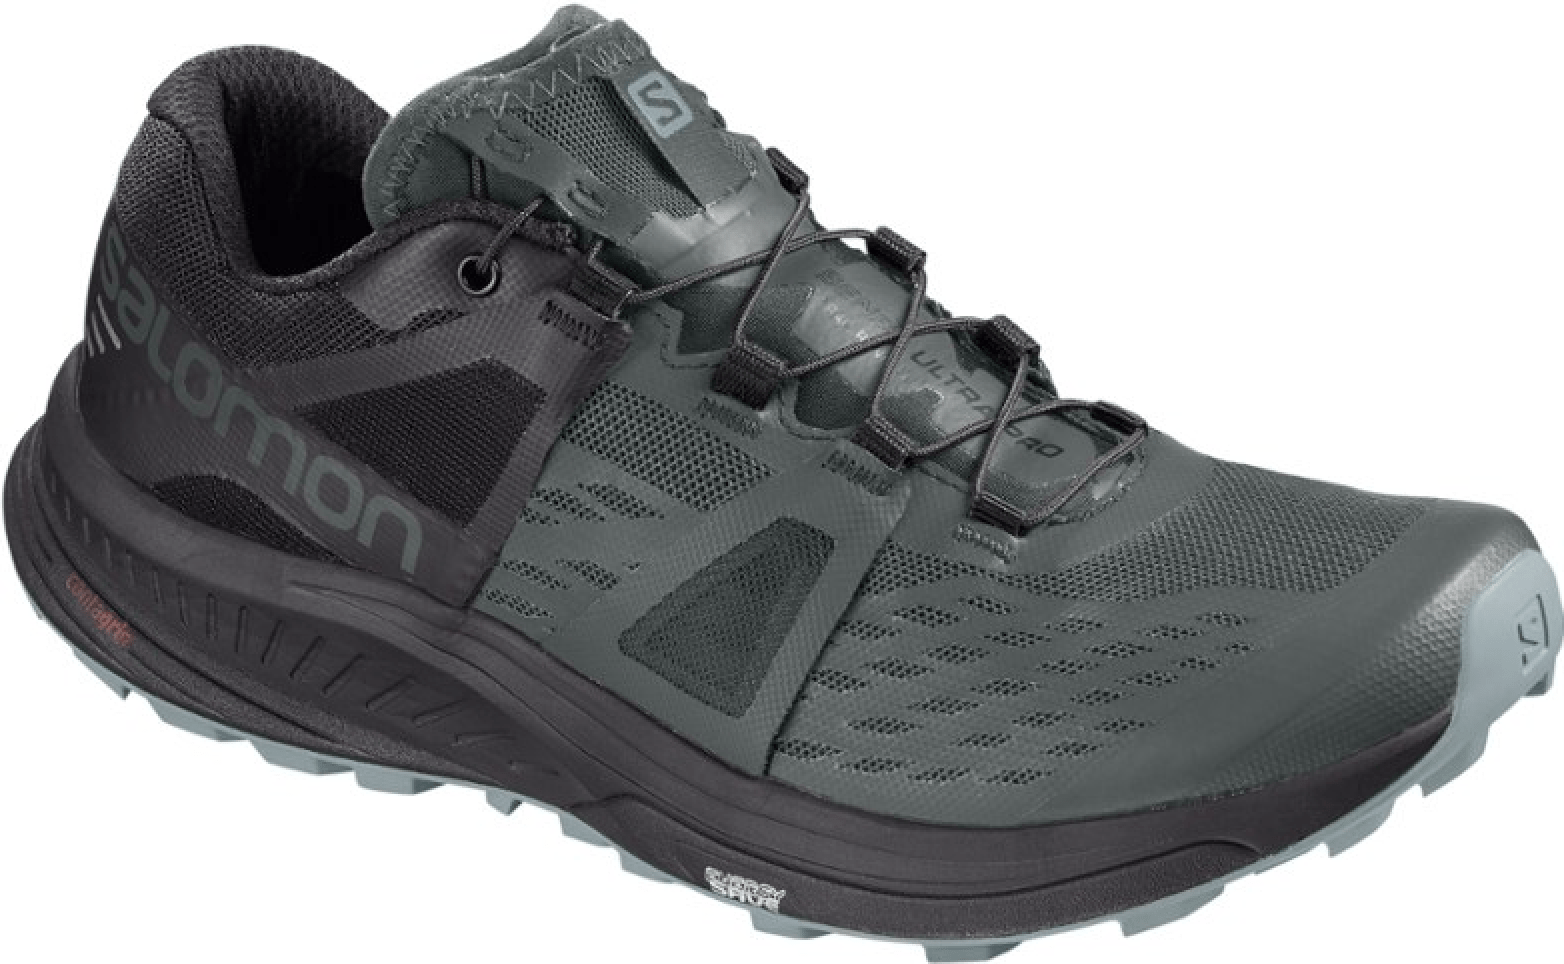 10 Best Trail Shoes For Pilgrims